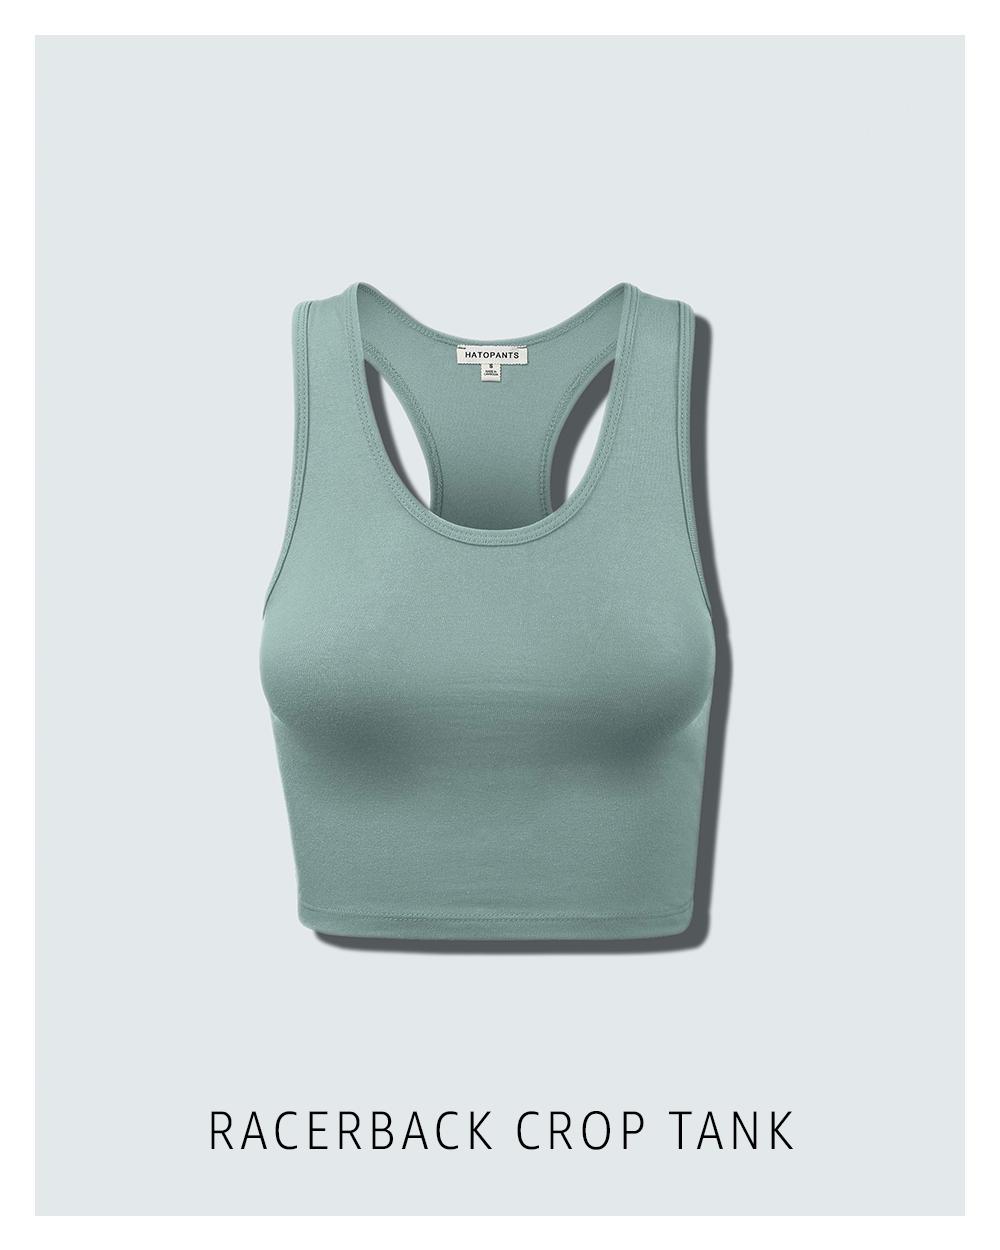 Racerback crop tank